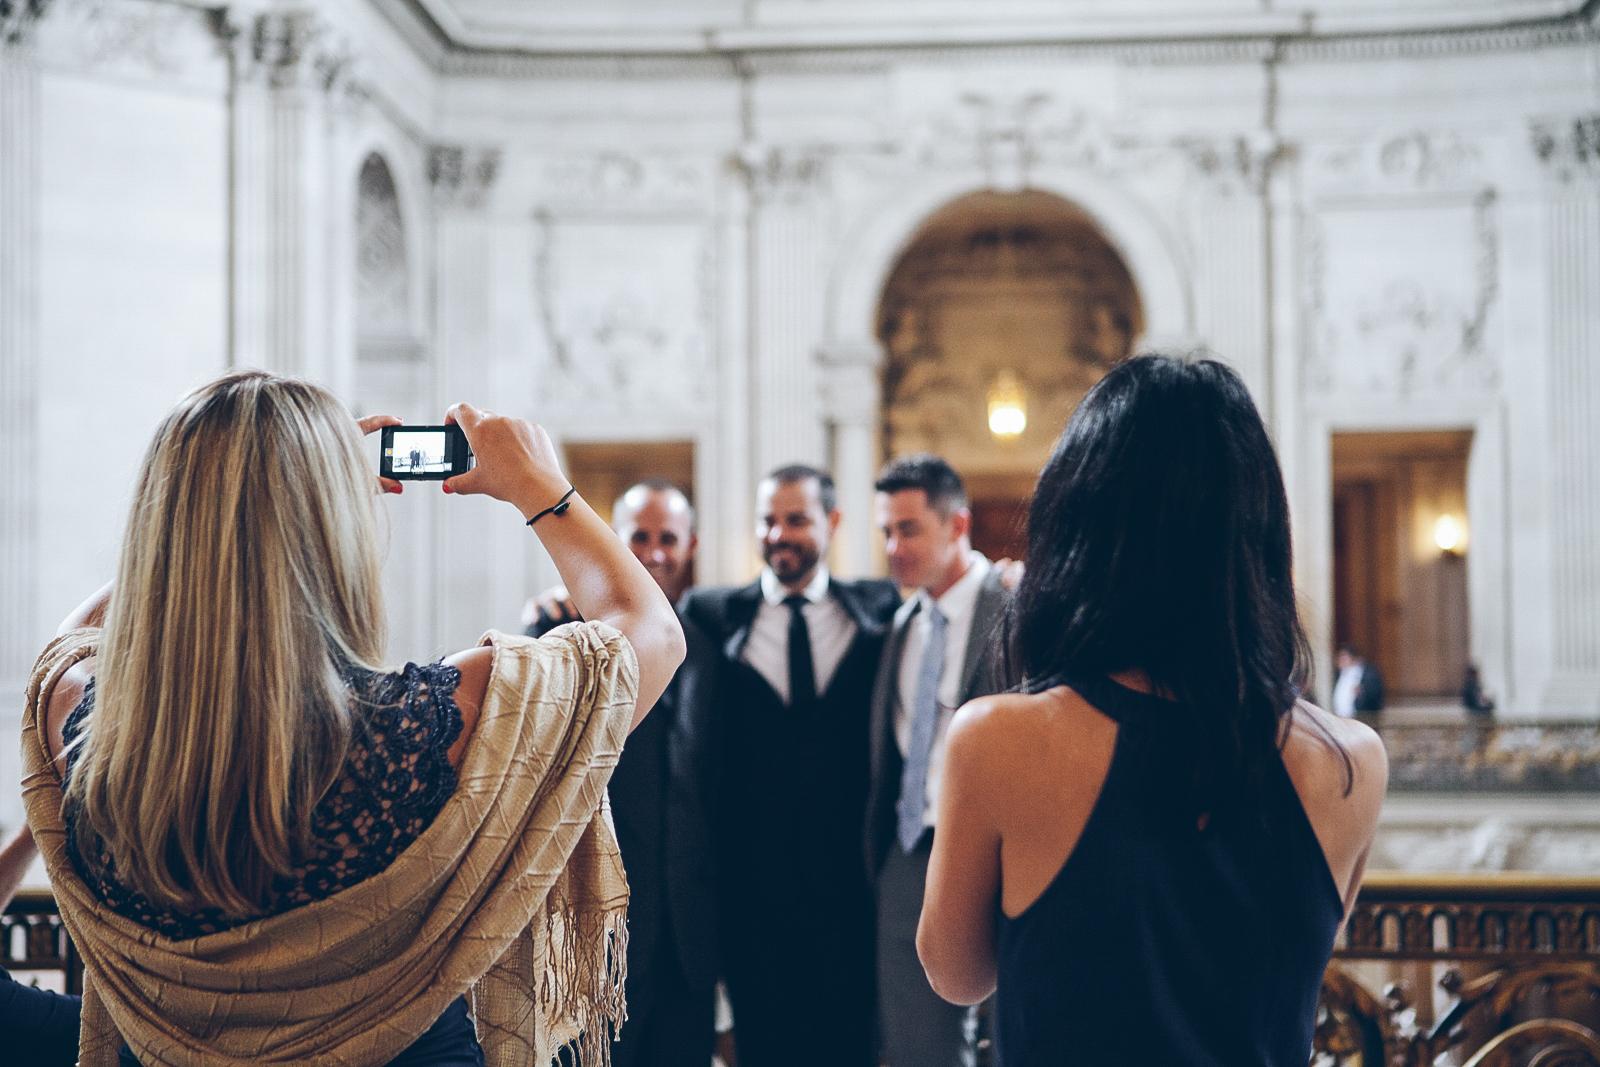 San_francisco_city_hall_wedding_photography_meegan_travis_ebony_siovhan_bokeh_photography_04.jpg